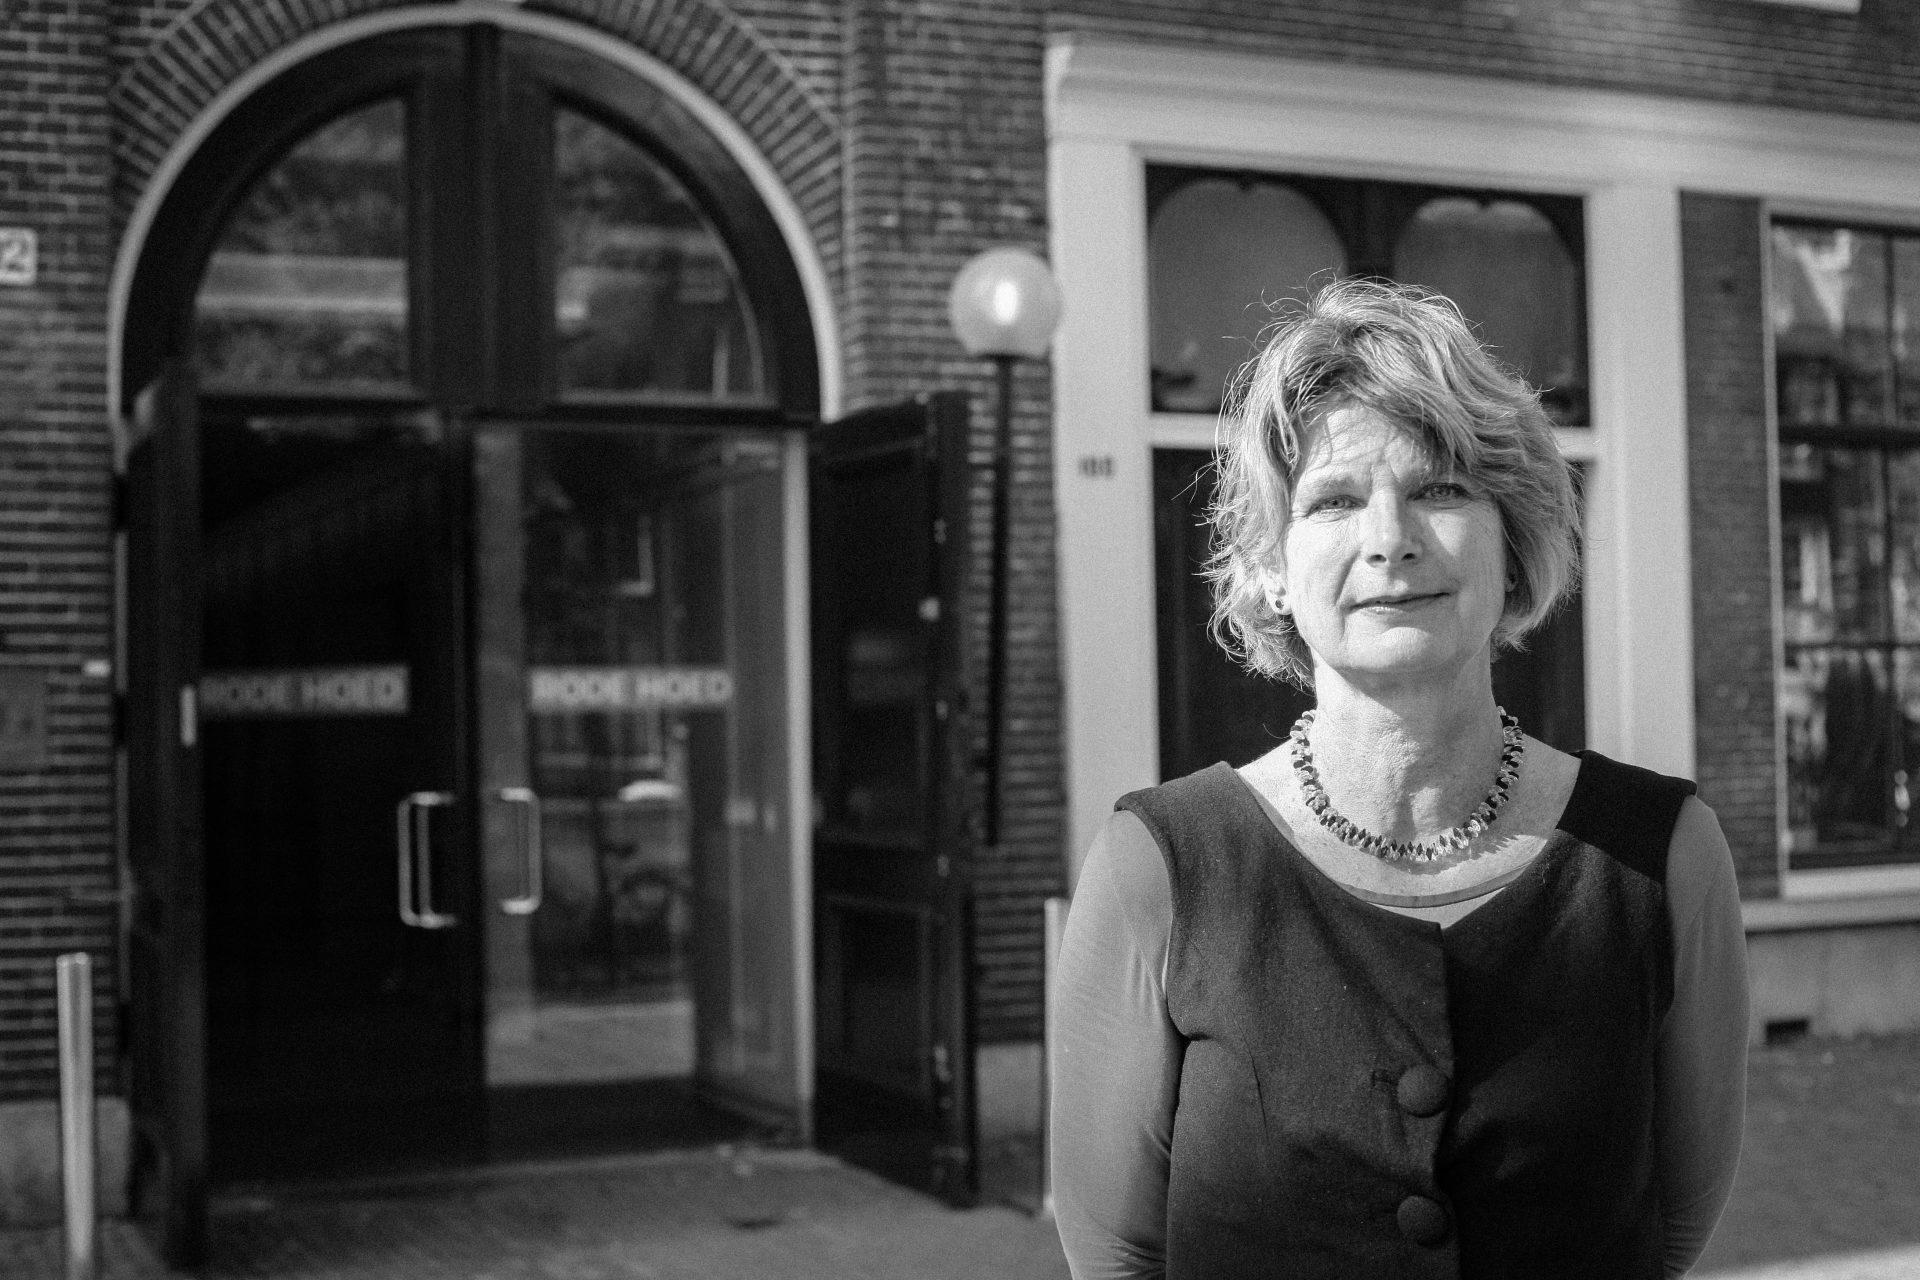 Symposium Christa Anbeek